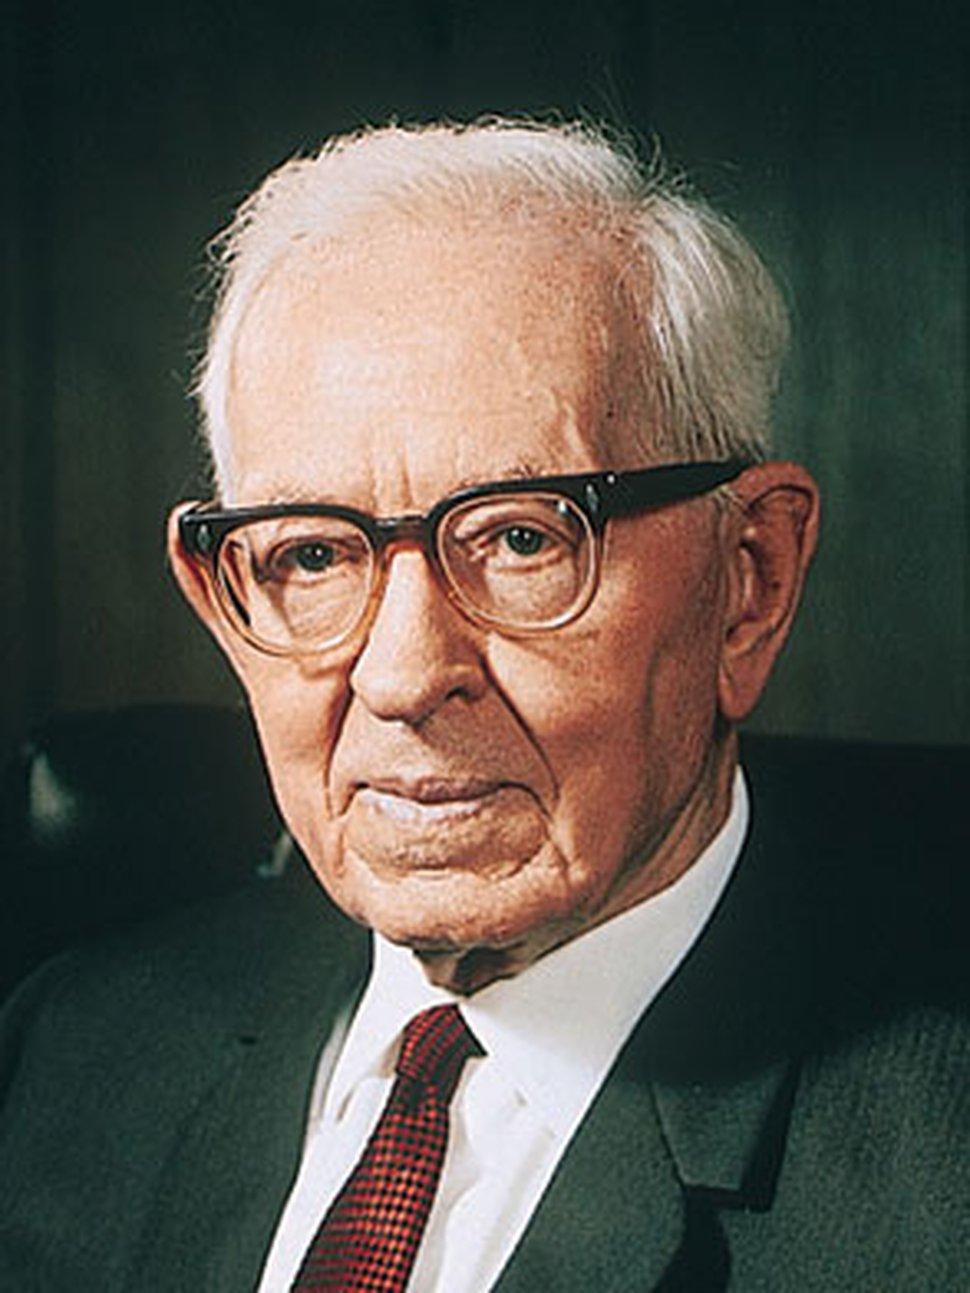 Former LDS Church President Joseph Fielding Smith